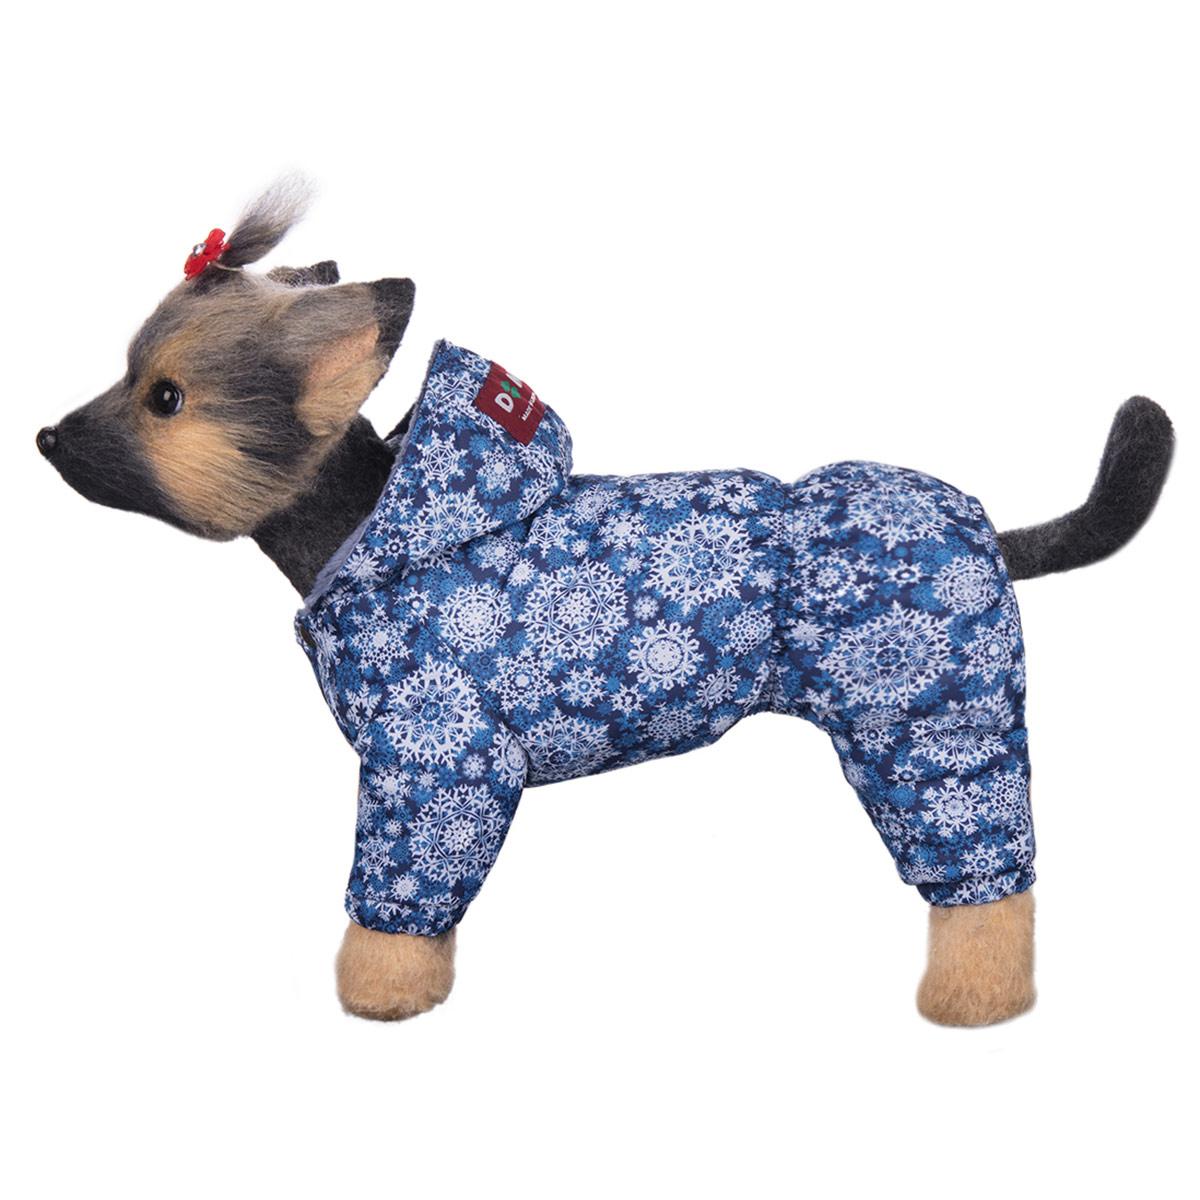 "Комбинезон для собак Dogmoda ""Зима"", для мальчика. Размер 3 (L)"